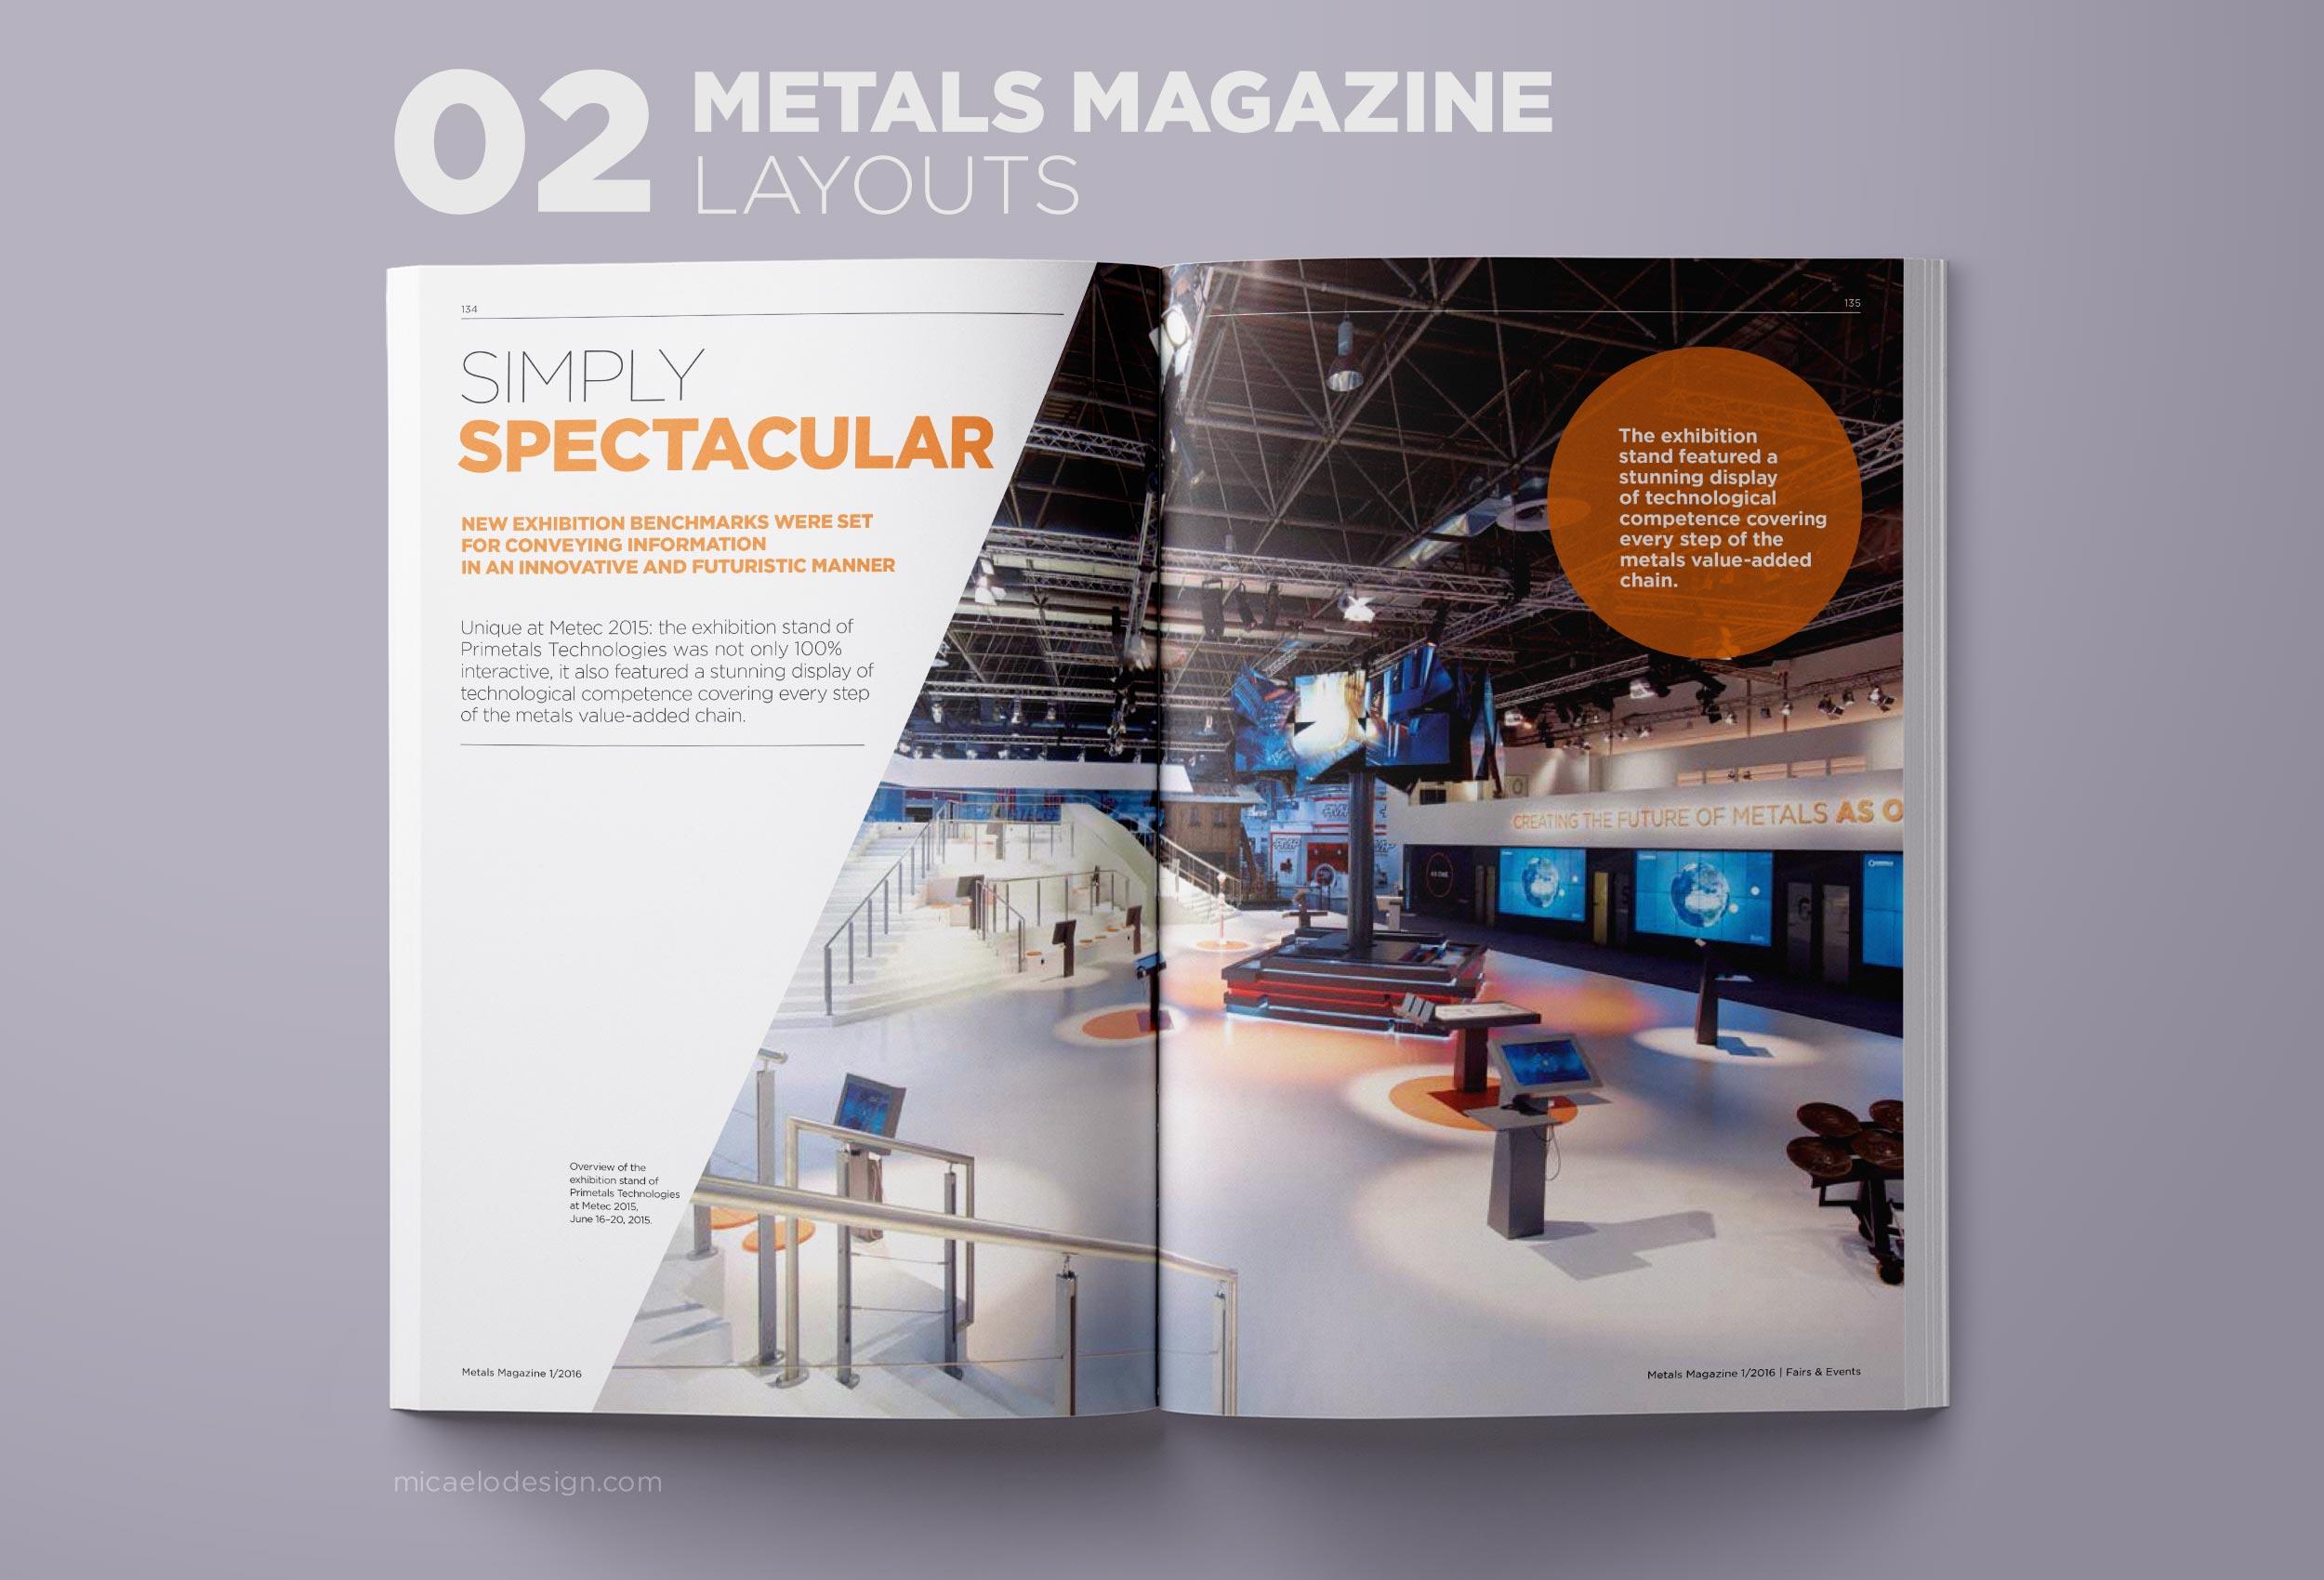 Primetals Metals Magazine layout N02